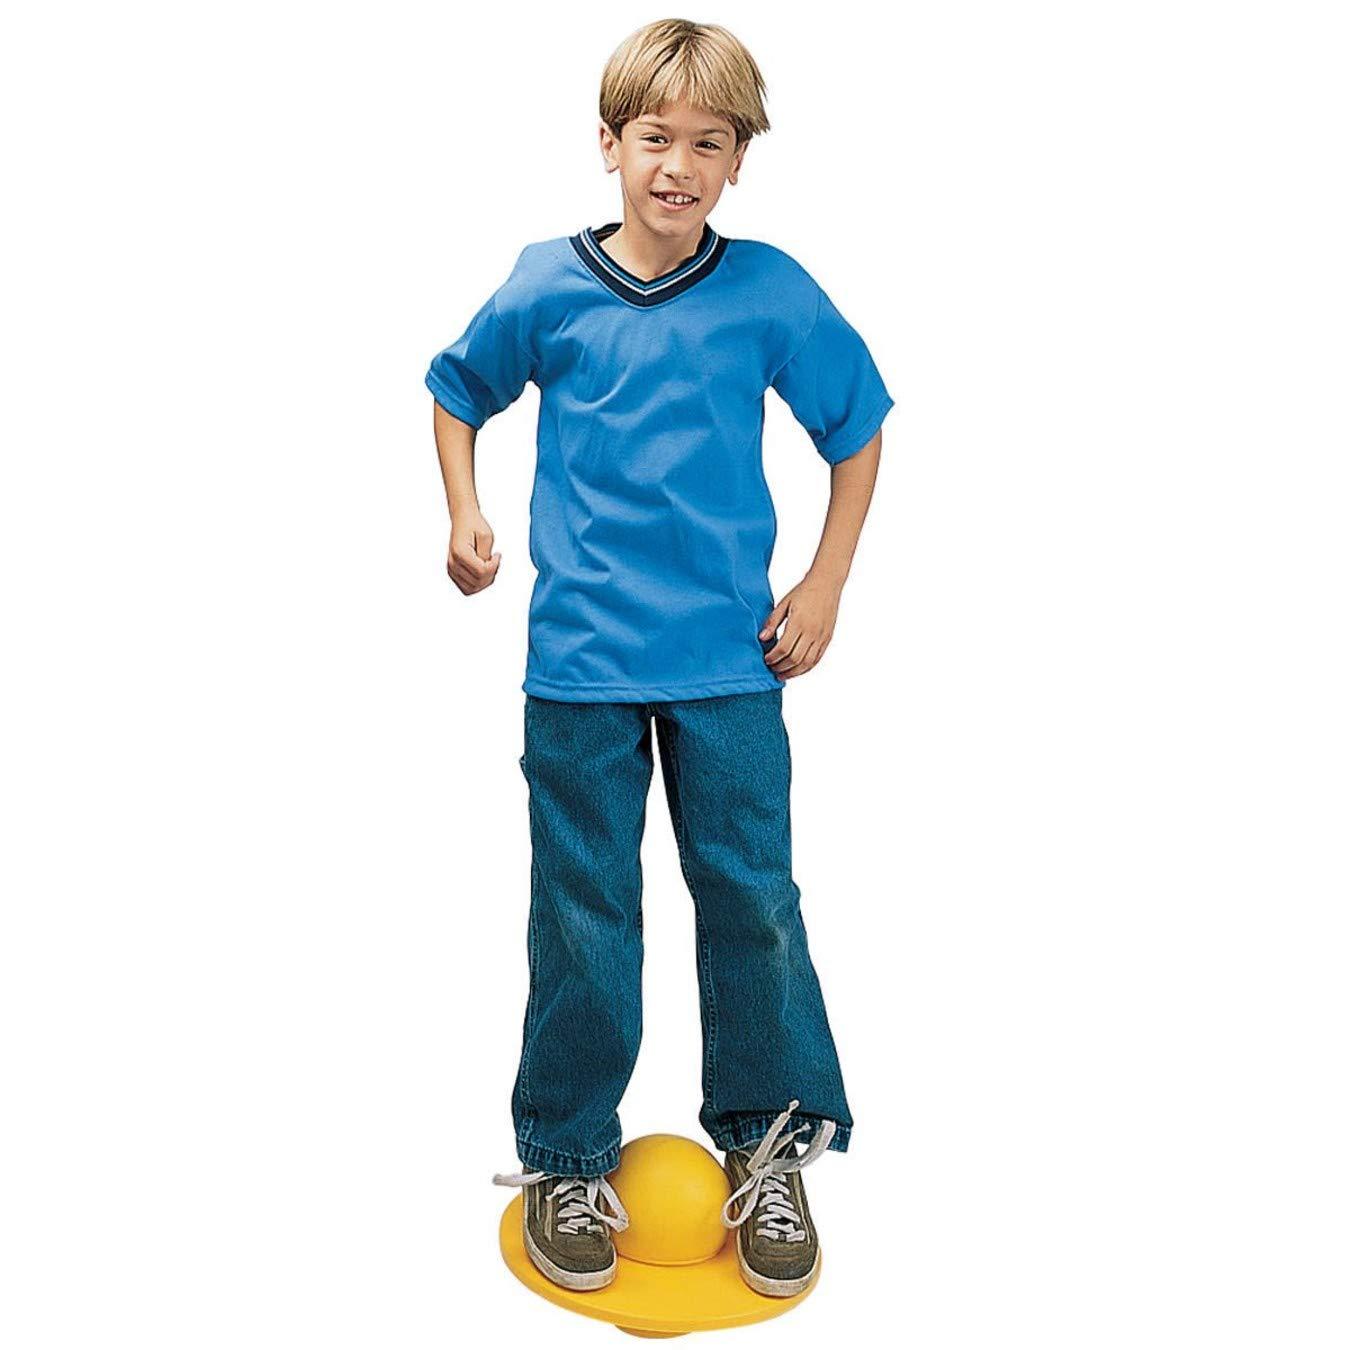 Lolo Balance Ball